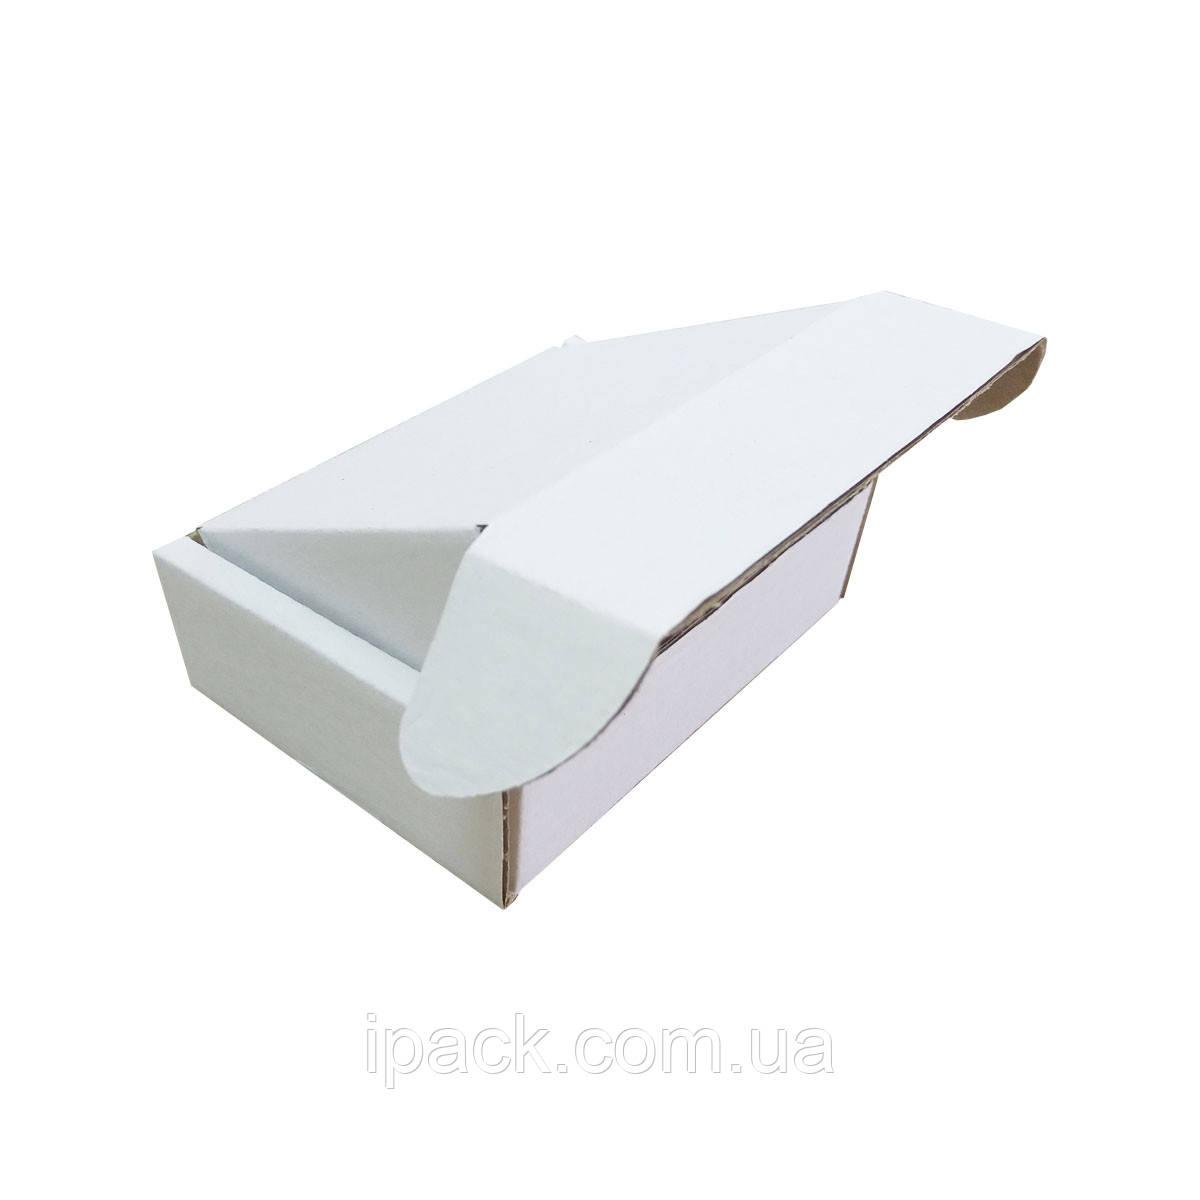 Коробка картонная самосборная, 85*48*35, мм, белая, микрогофрокартон